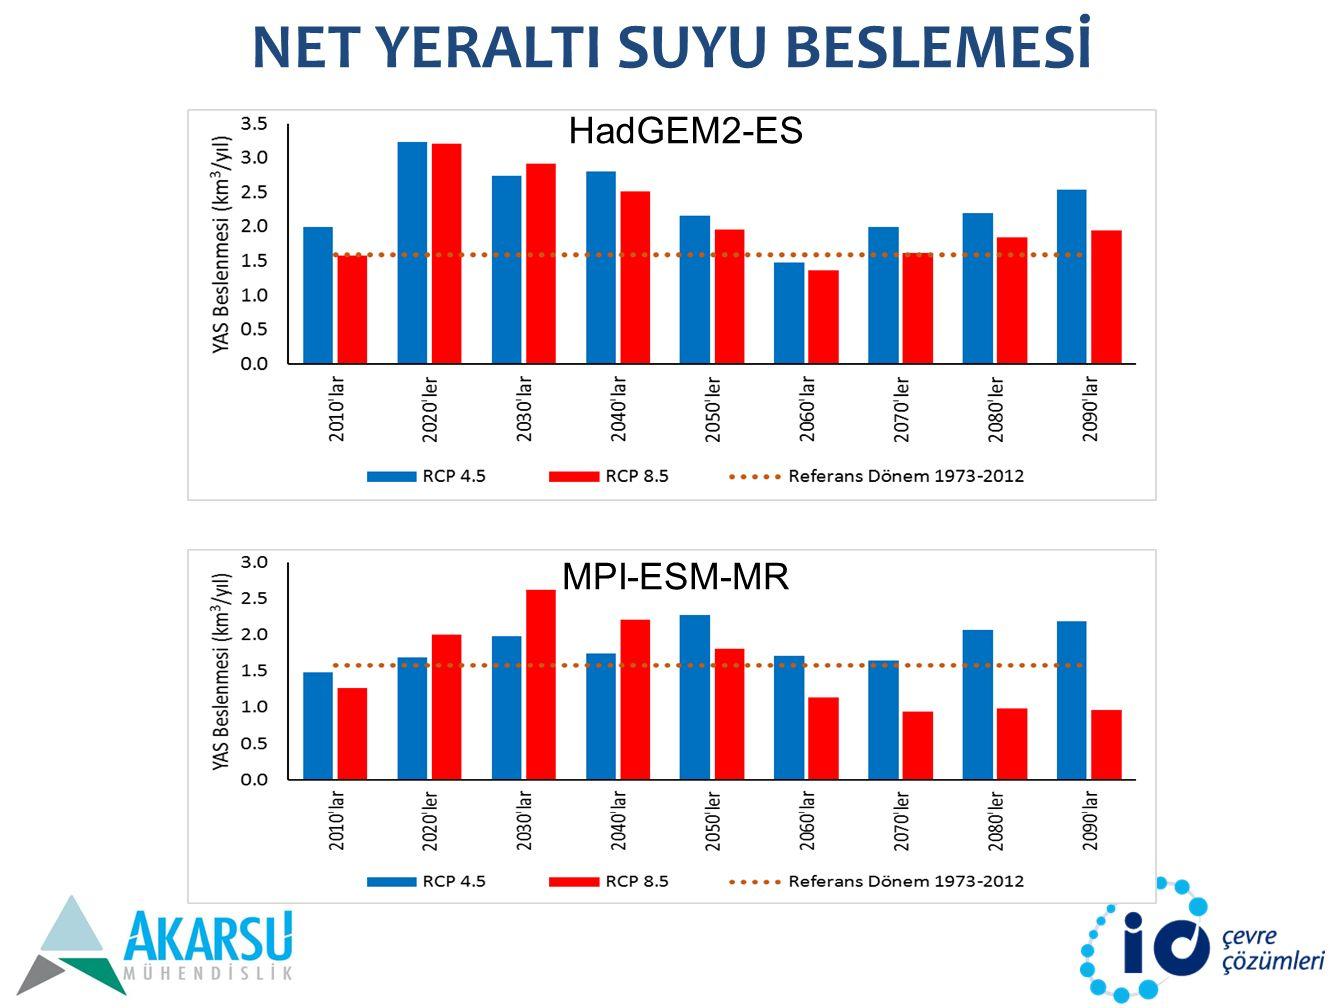 NET YERALTI SUYU BESLEMESİ HadGEM2-ES MPI-ESM-MR